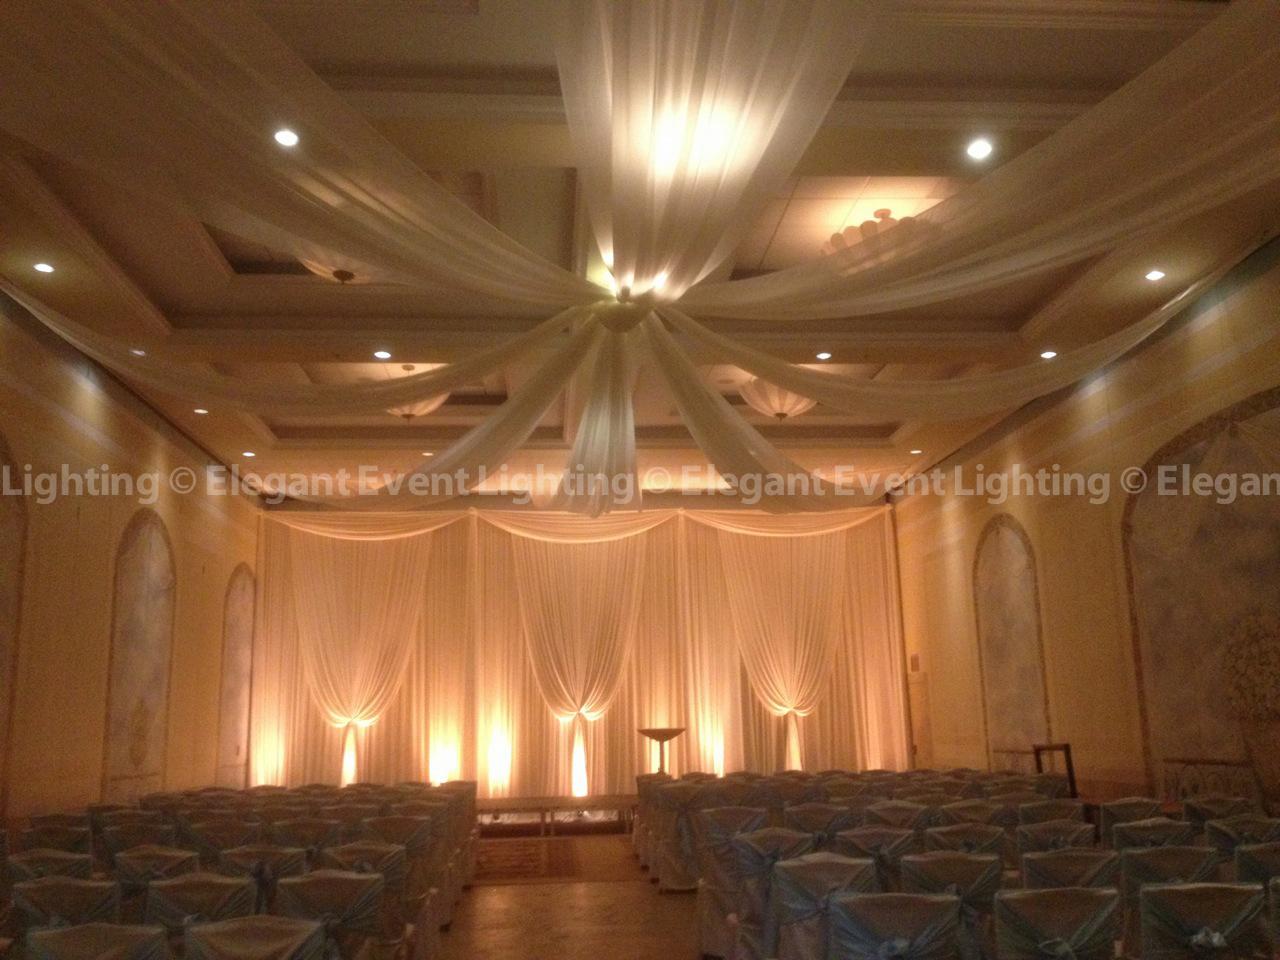 Monogram lighting custom wedding monogram lighting - Christina Amp Eric S Venuti S Wedding Elegant Event